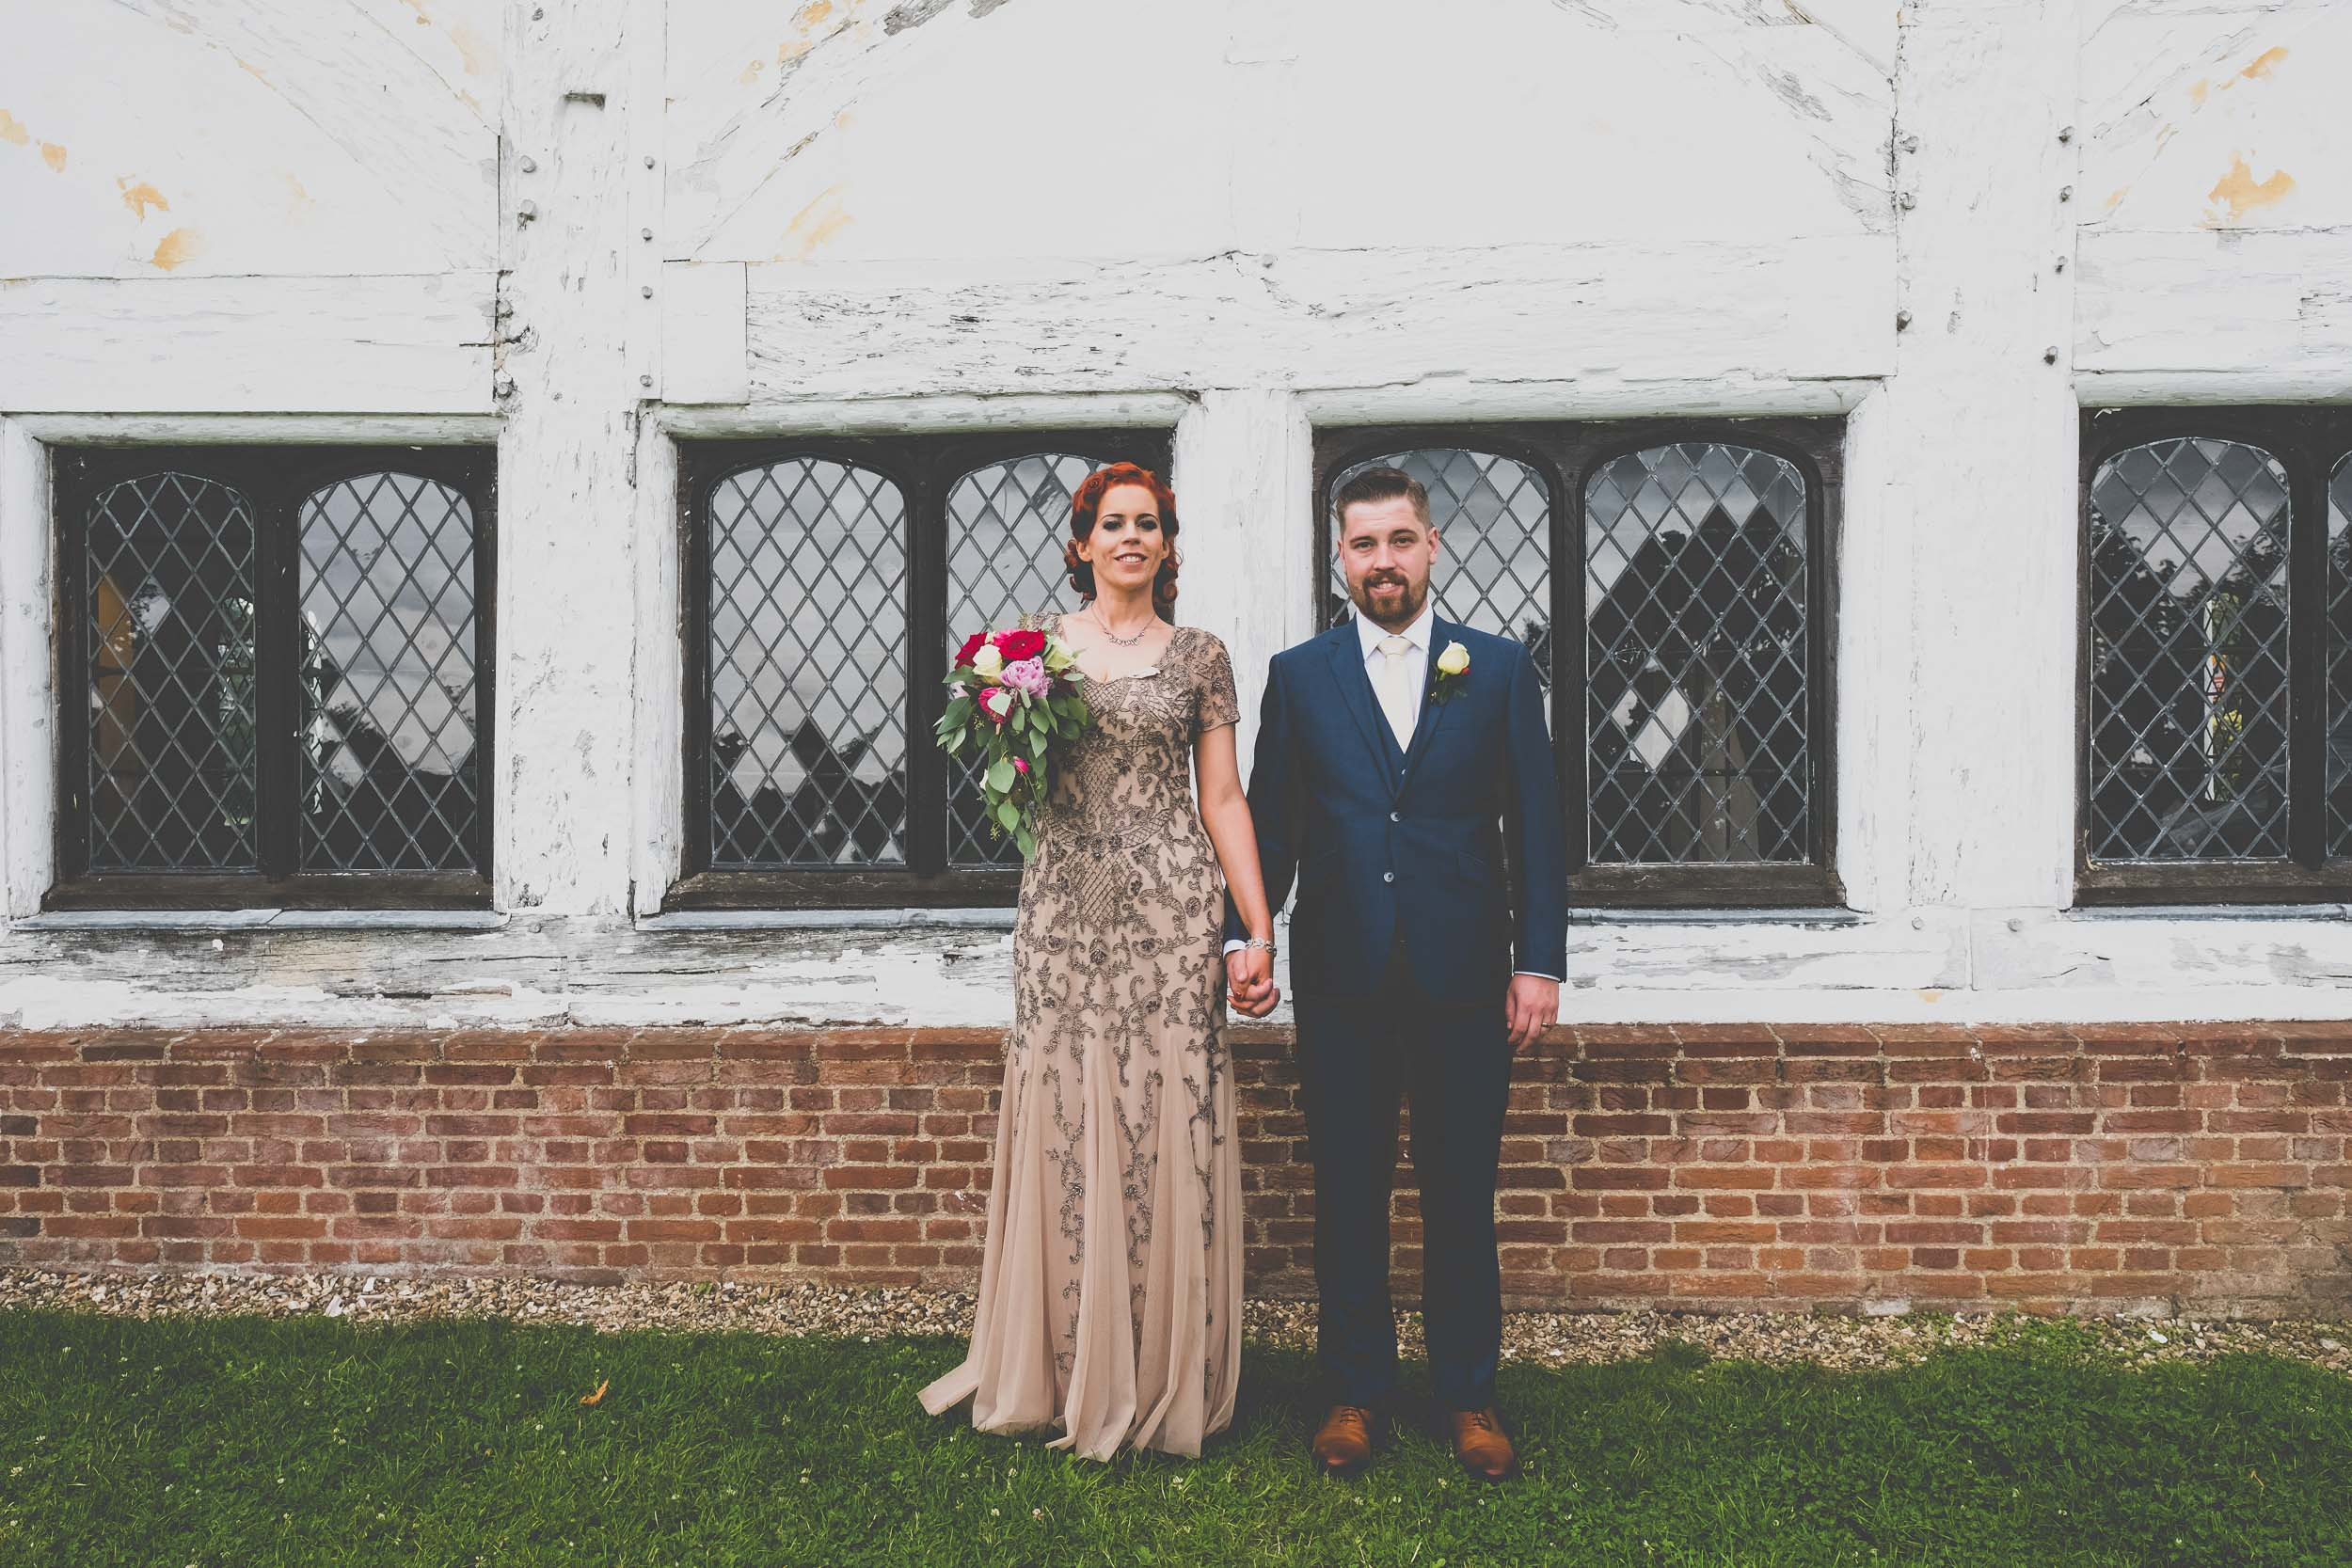 queen-elizabeths-hunting-lodge-epping-forest-wedding162.jpg